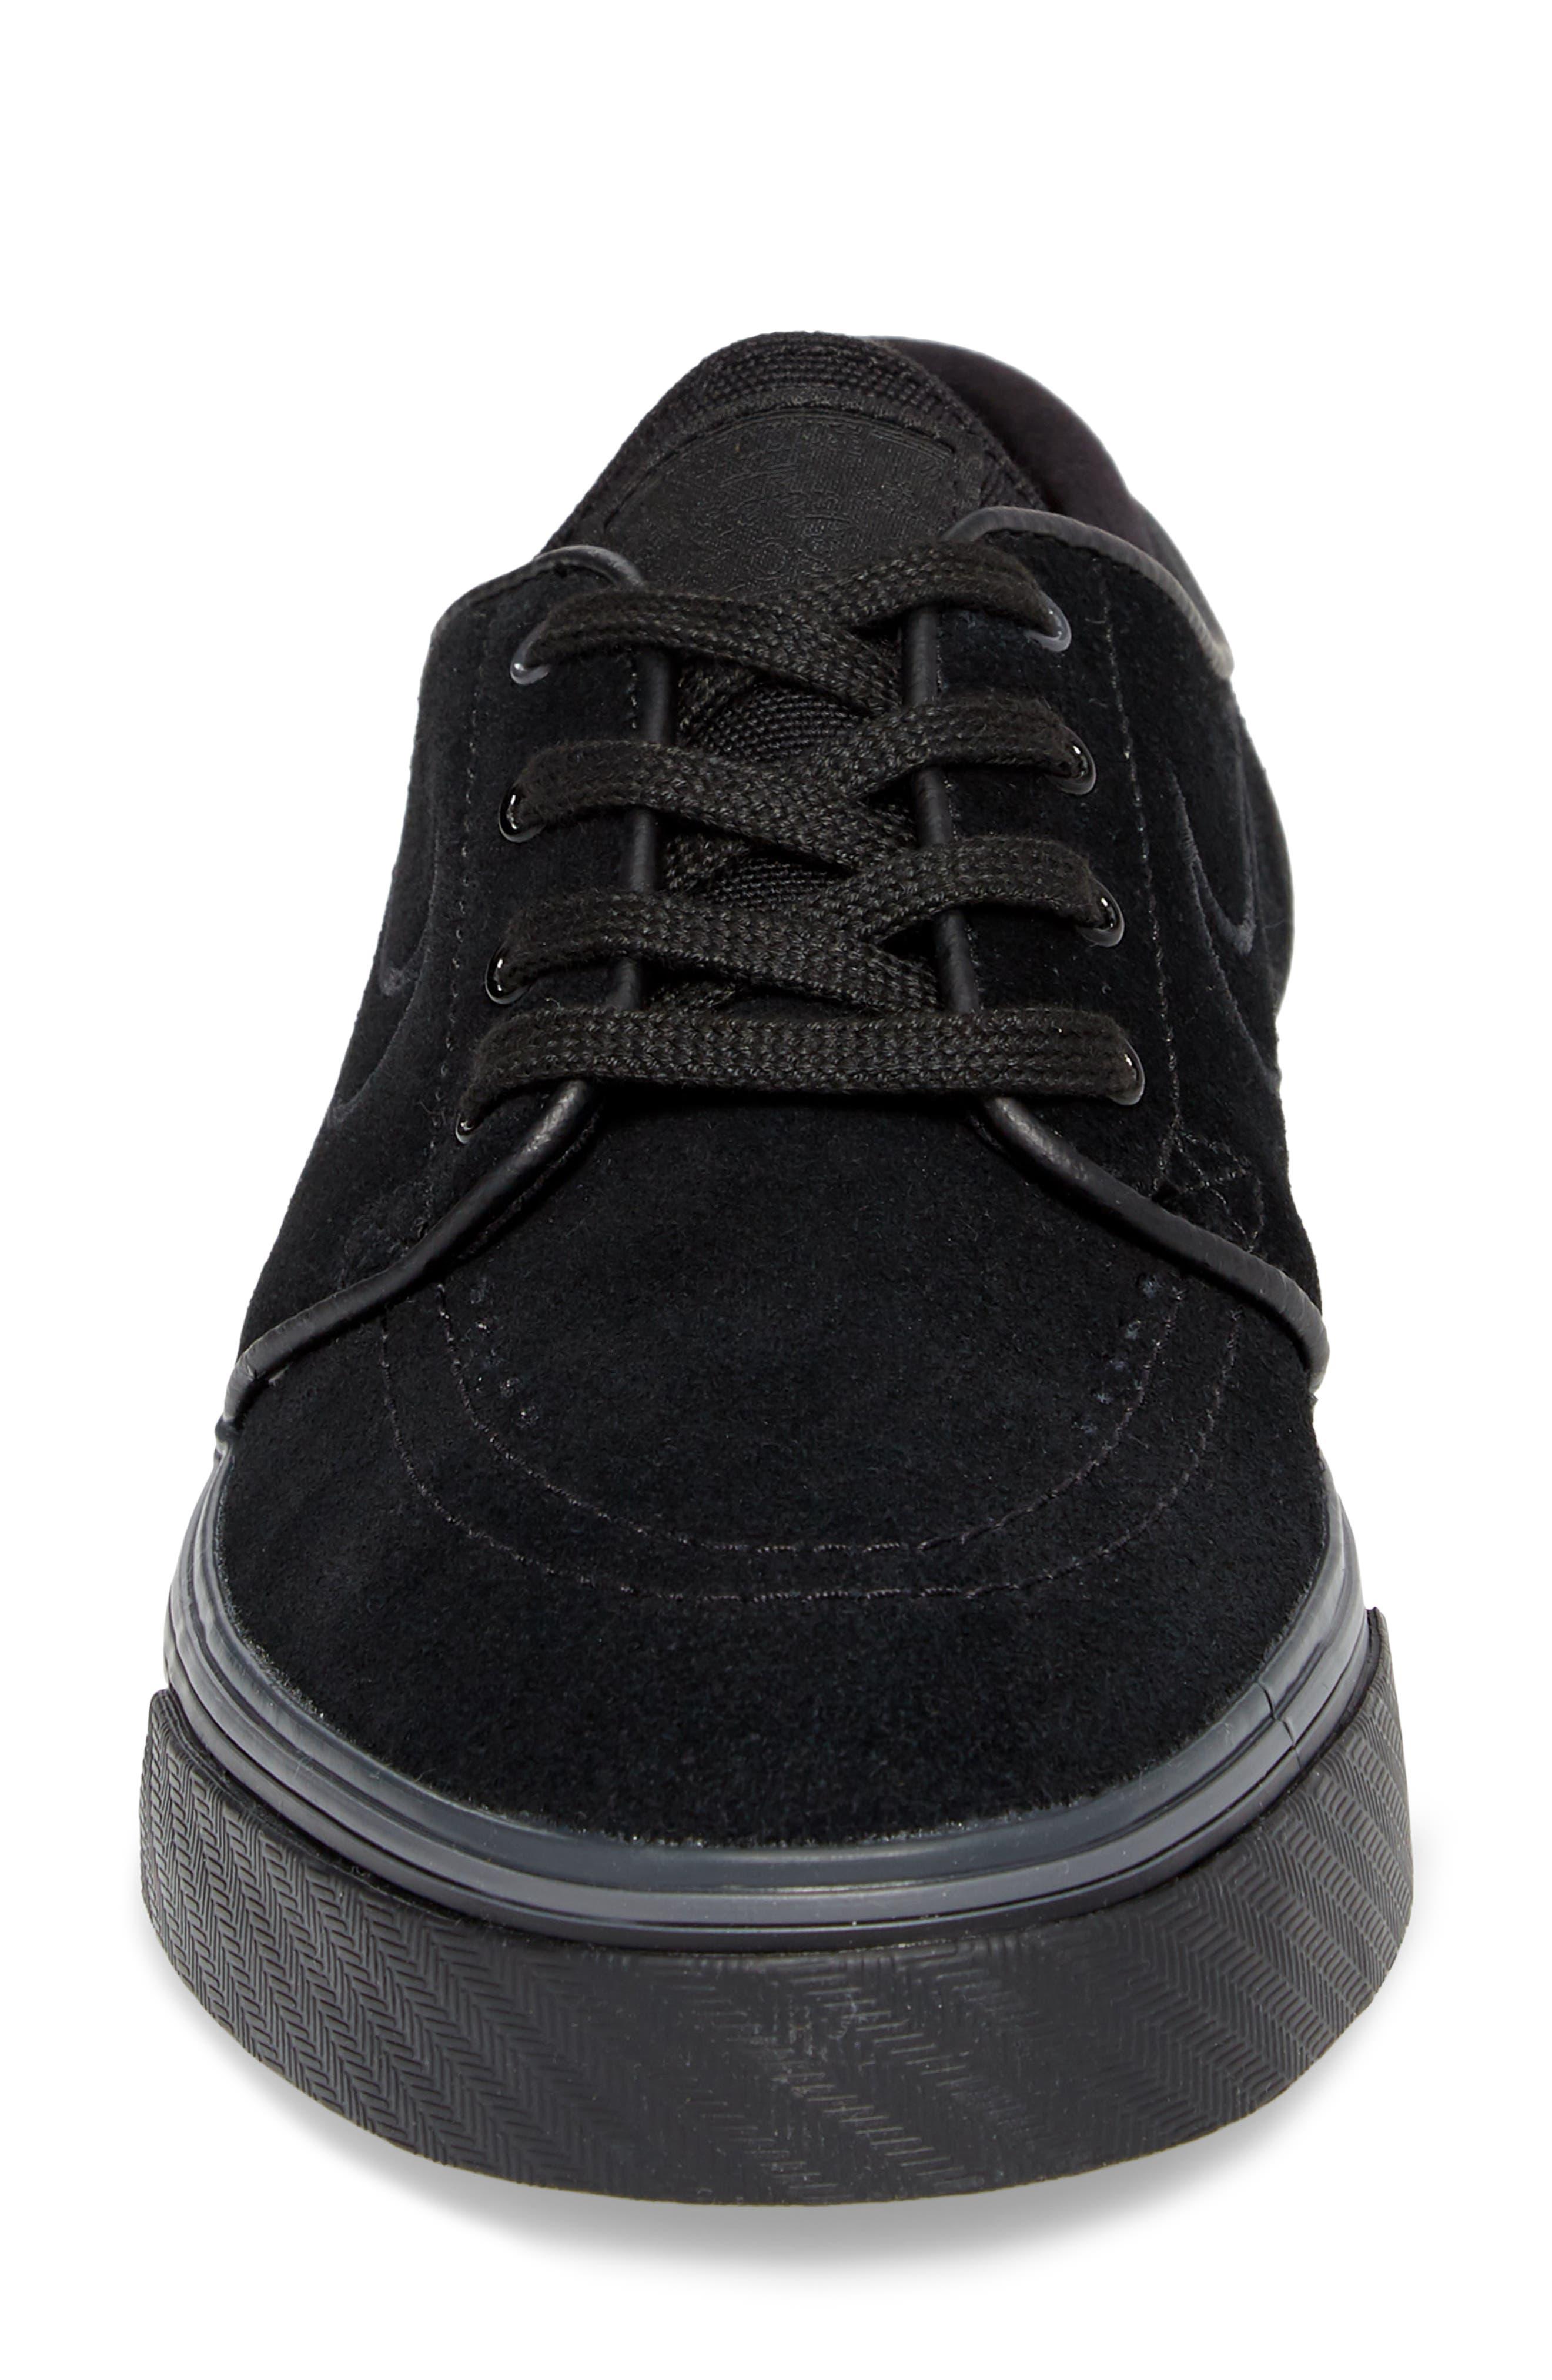 SB Air Zoom Stefan Janoski Skate Sneaker,                             Alternate thumbnail 4, color,                             BLACK/ BLACK/ BLACK